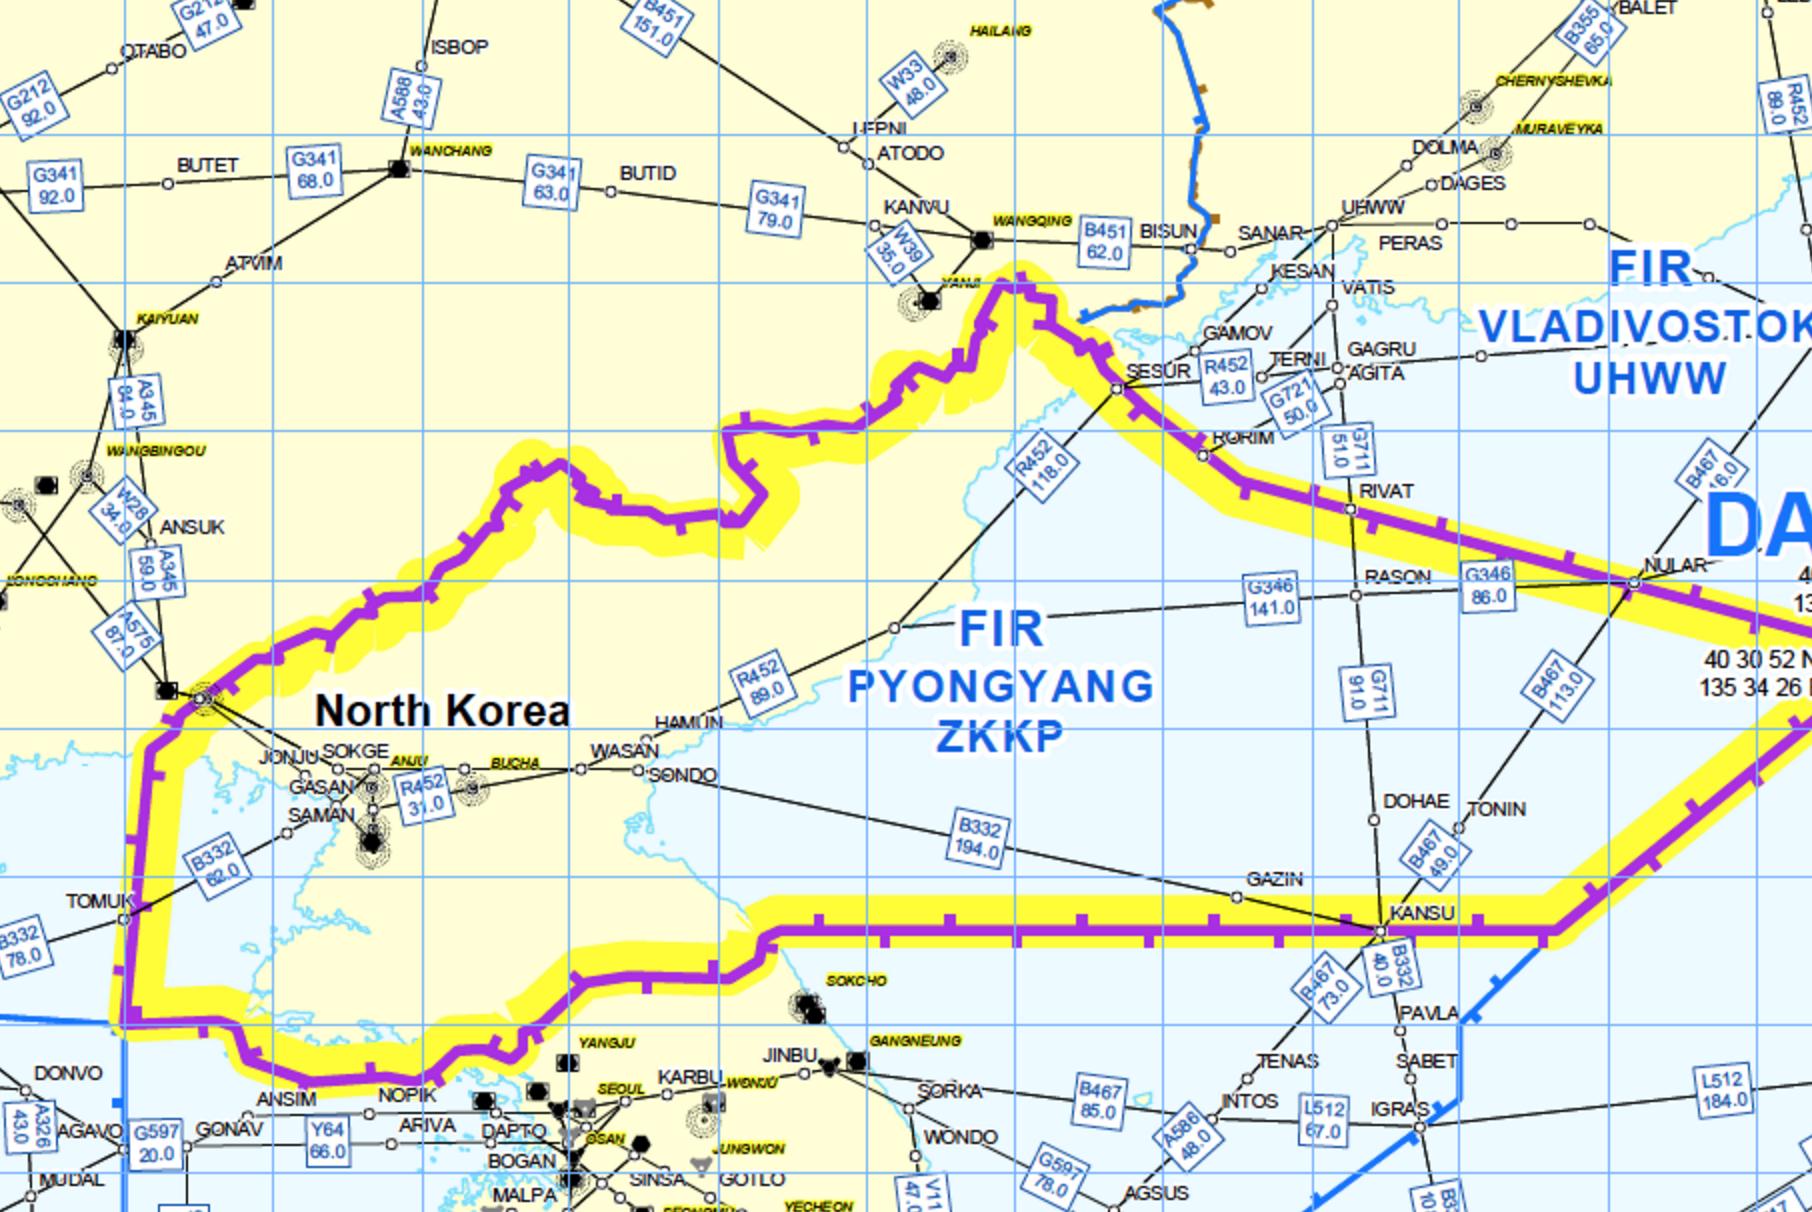 North Korea overflight getting riskier